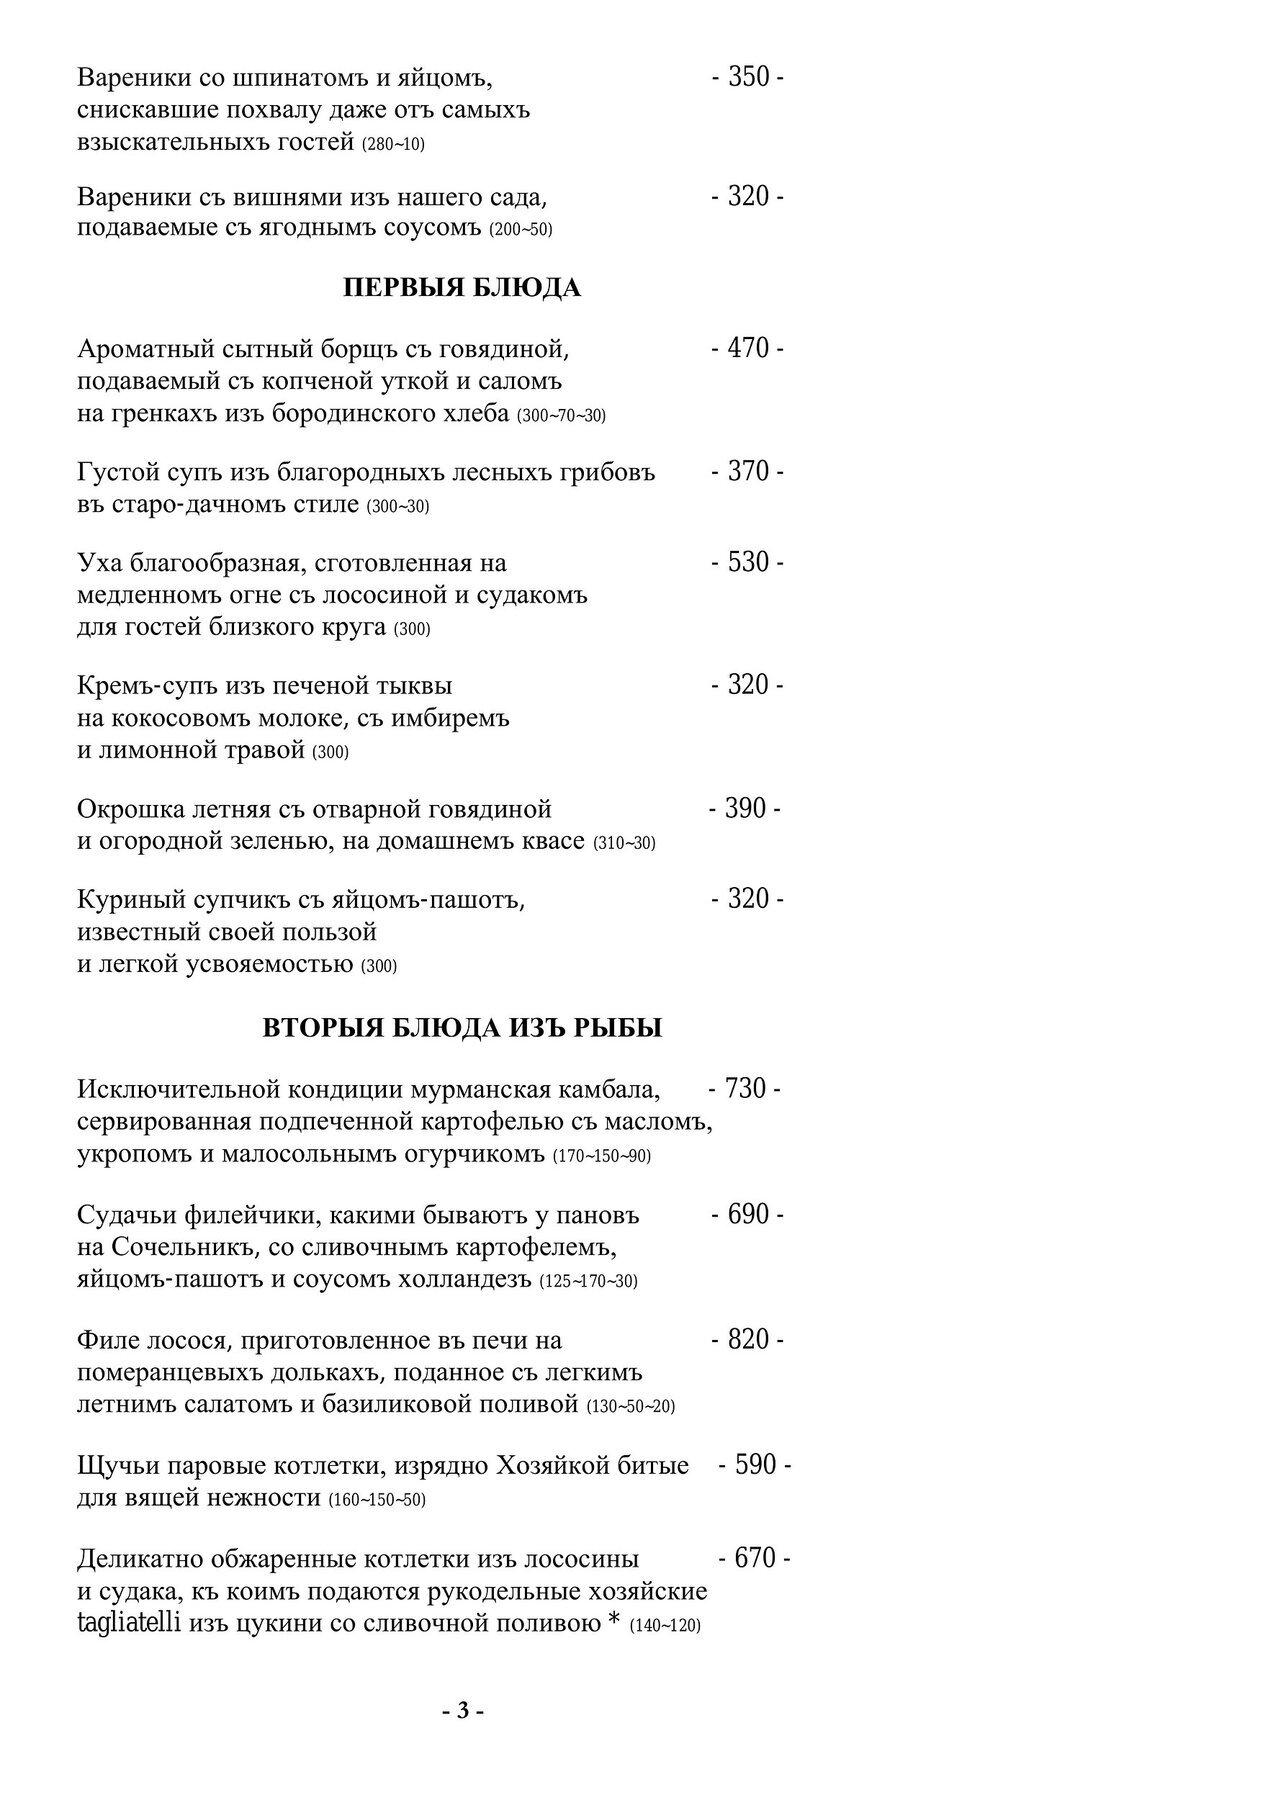 Меню ресторана Чеховъ на Петропавловской улице фото 3